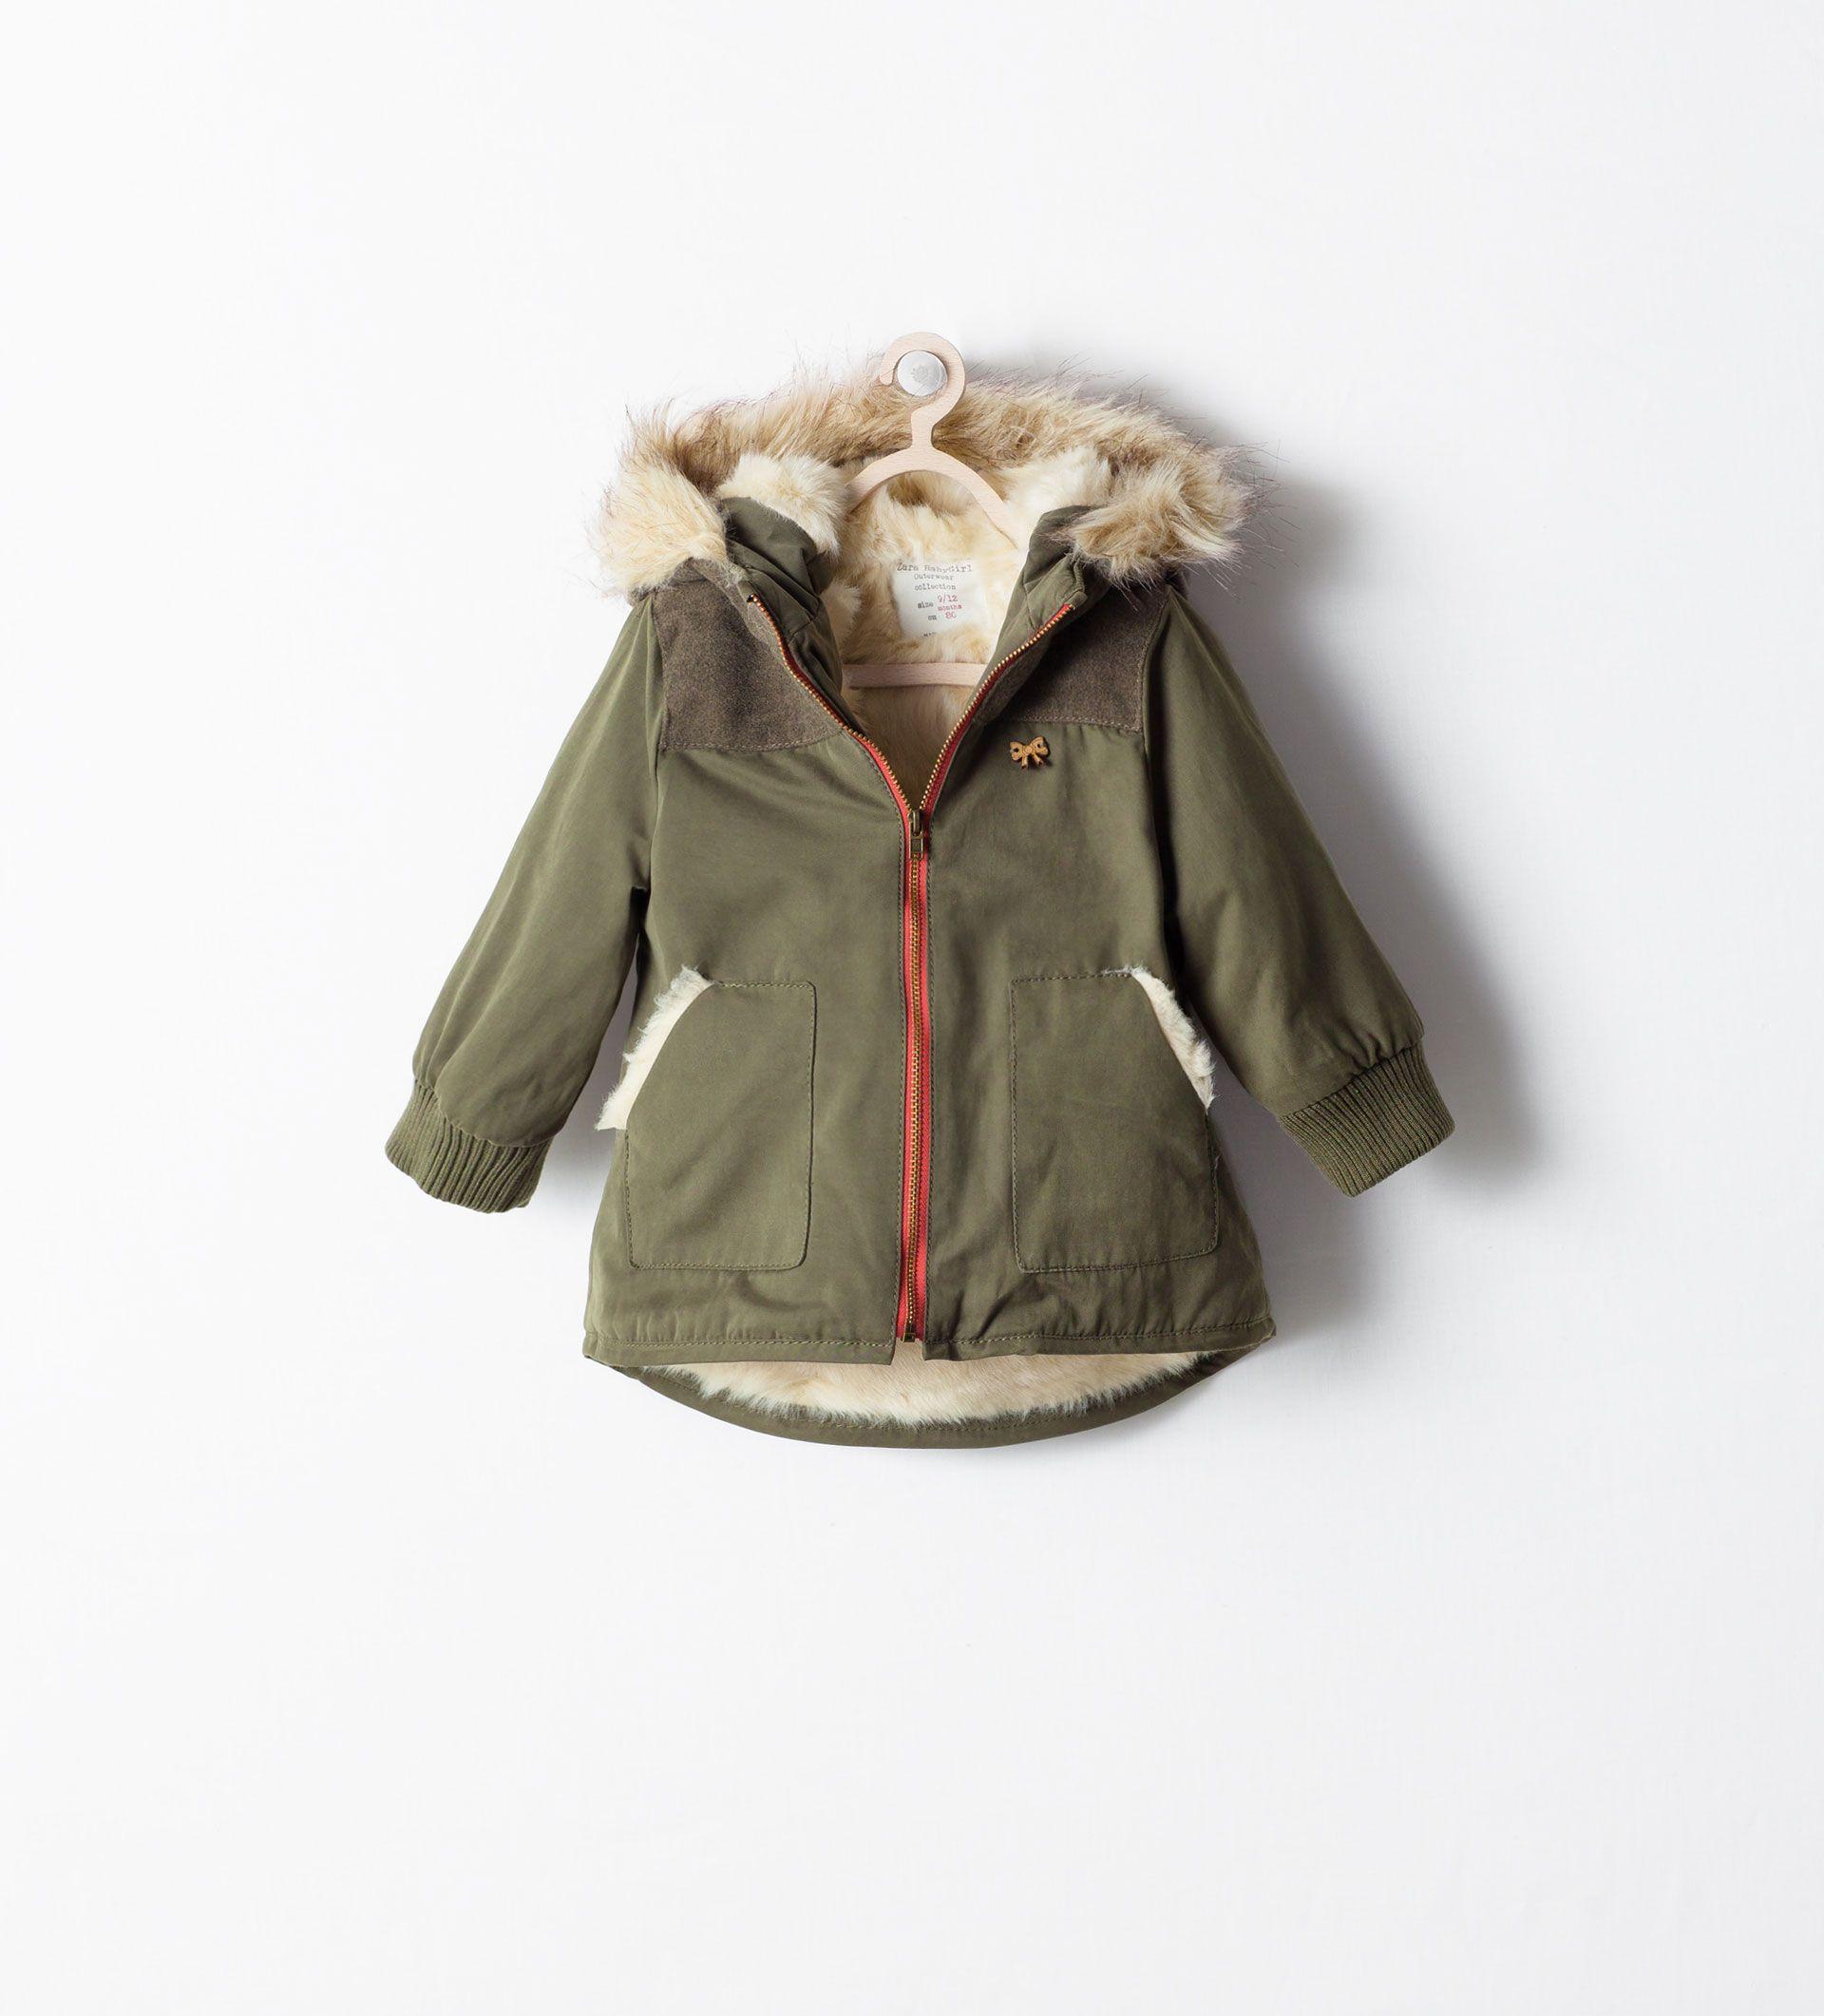 Mantels Baby Meisje 3 Maanden 3 Jaar Kinderen Zara Belgie Madchen Wintermode Baby Winterjacke Zara Kinder